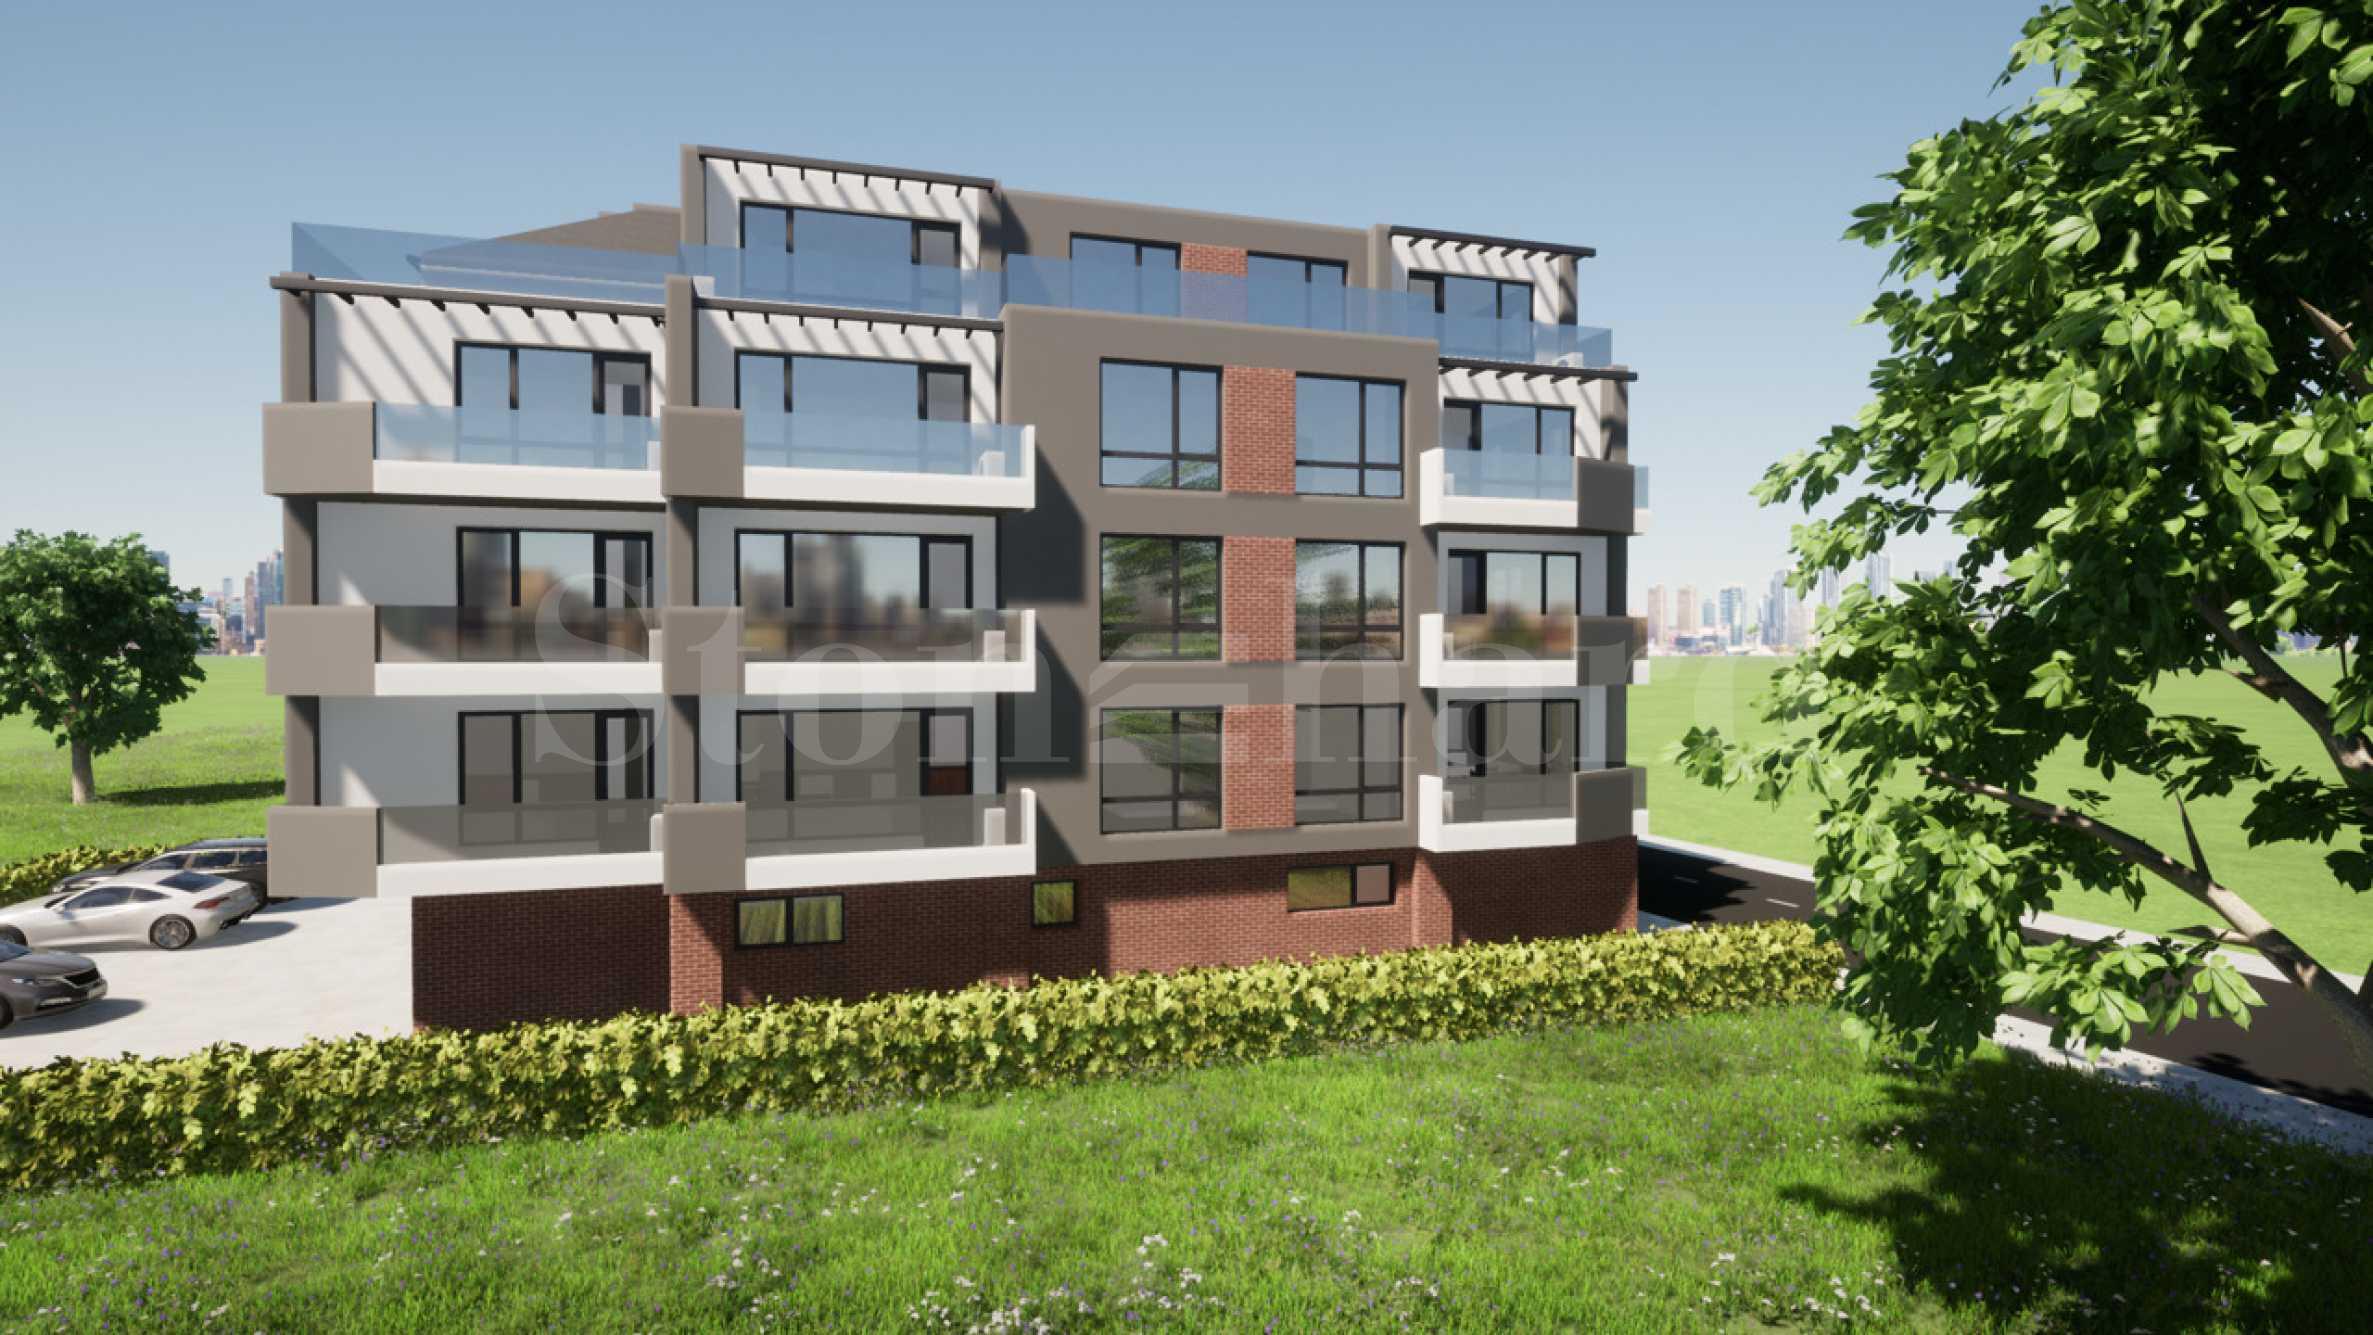 New-build seaside apartments in Burgas. No maintenance fee2 - Stonehard